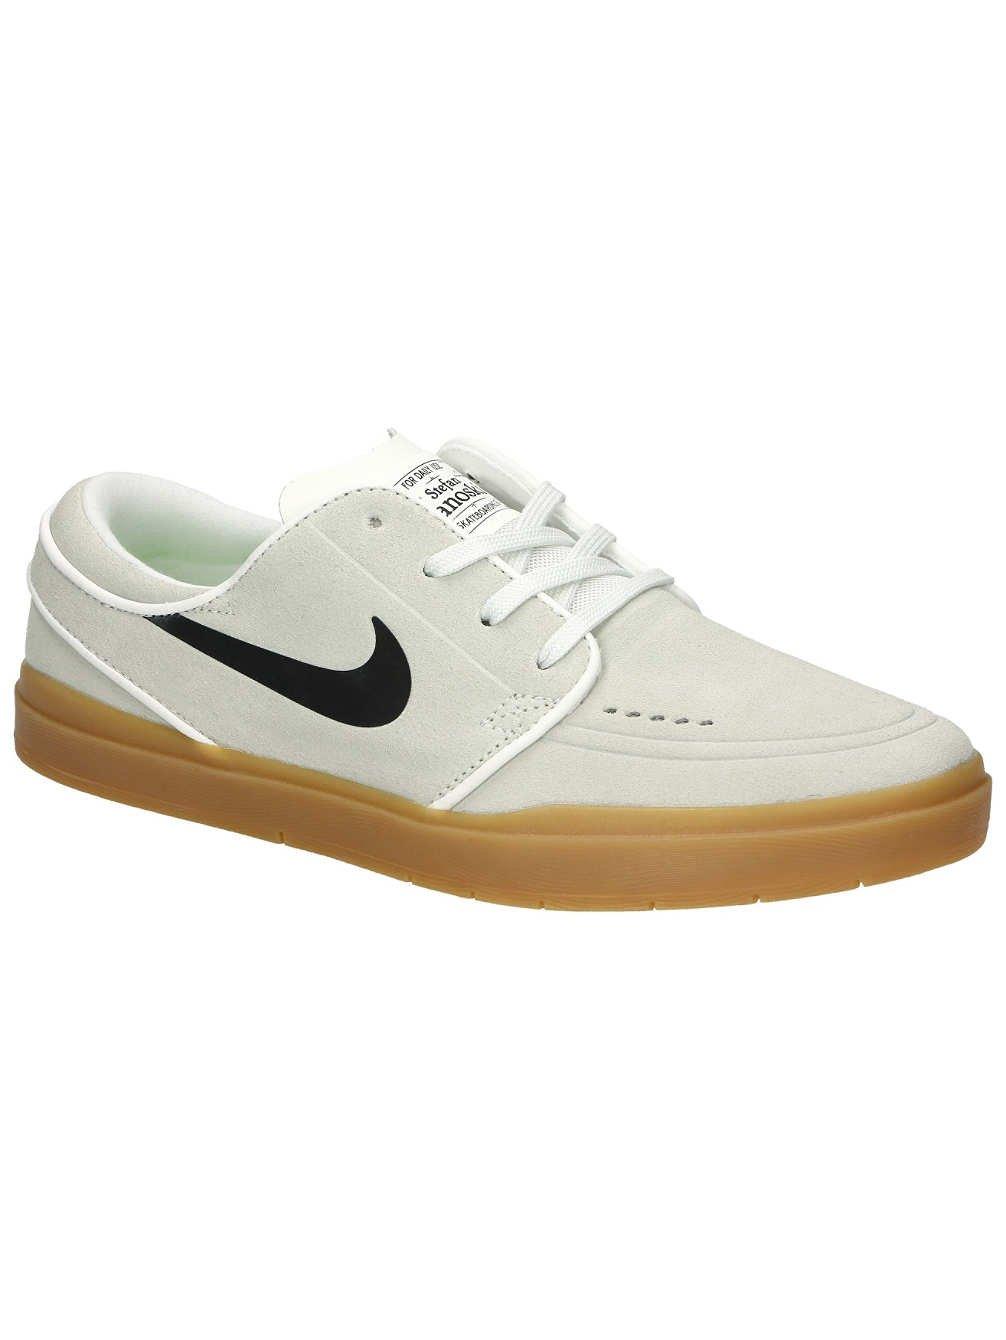 best cheap 6647e 89414 Galleon - Nike Stefan Janoski Hyperfeel Mens Skateboarding-Shoes  844443-100 9.5 - Summit White Black Gum Light Brown